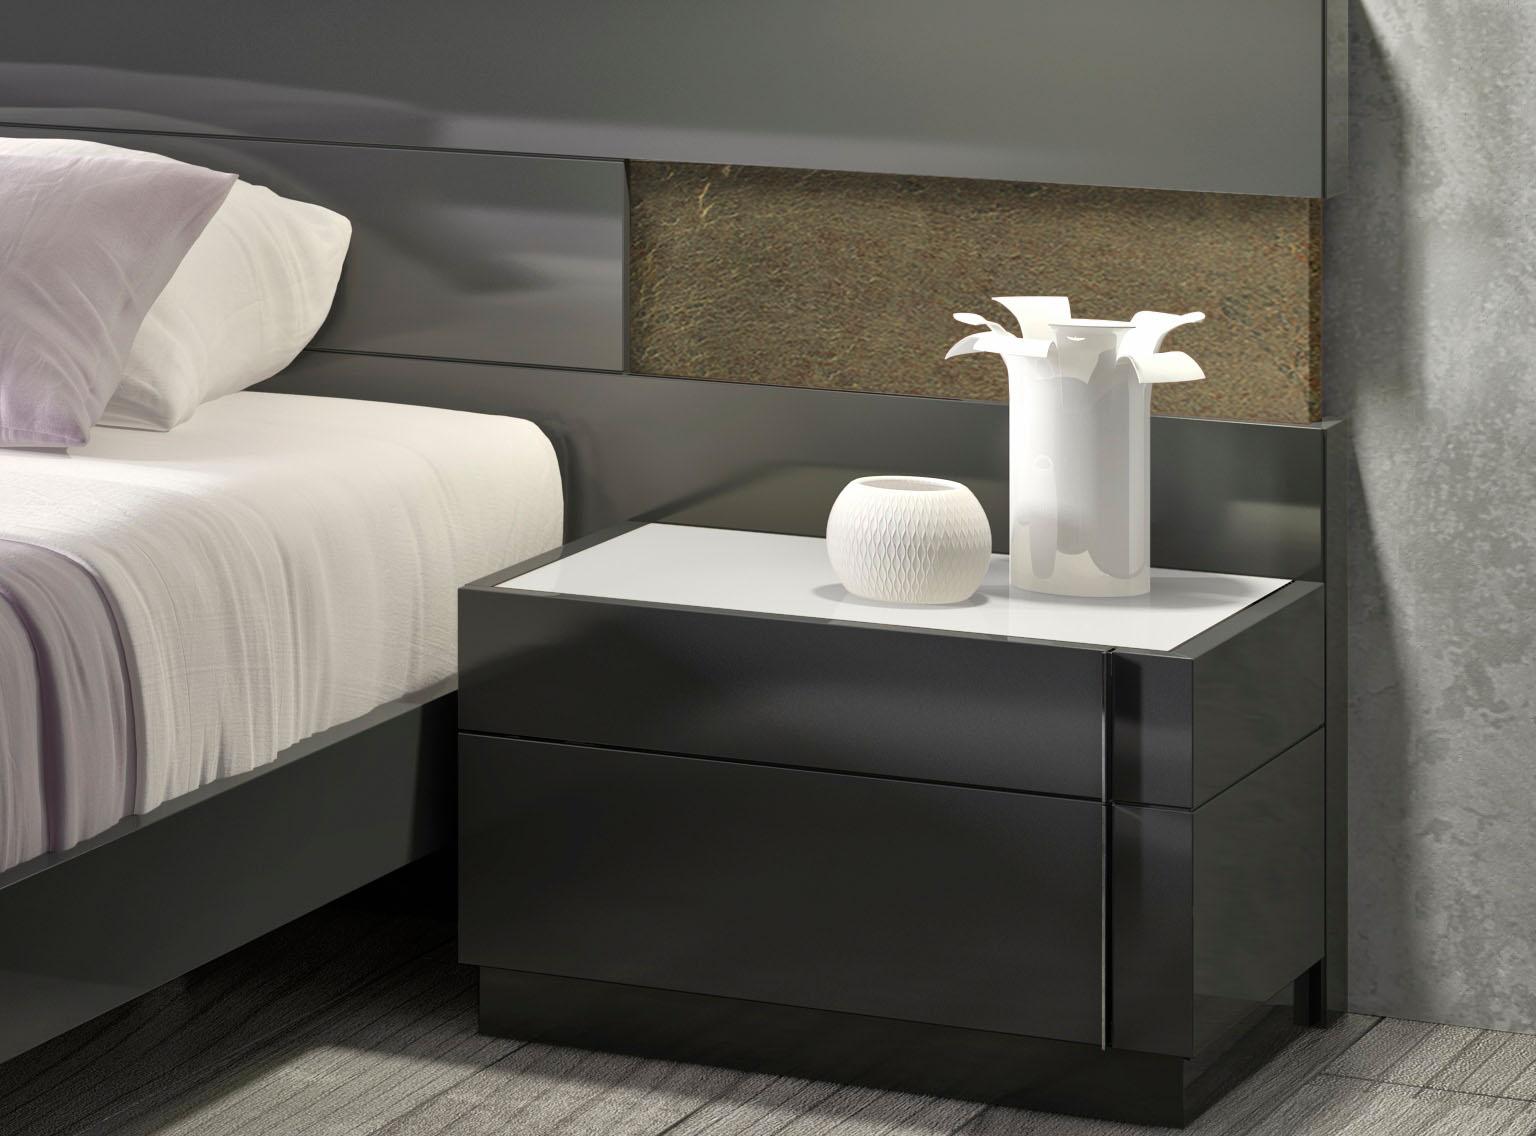 lacquered stylish wood elite platform bed with long panels las vegas. Black Bedroom Furniture Sets. Home Design Ideas